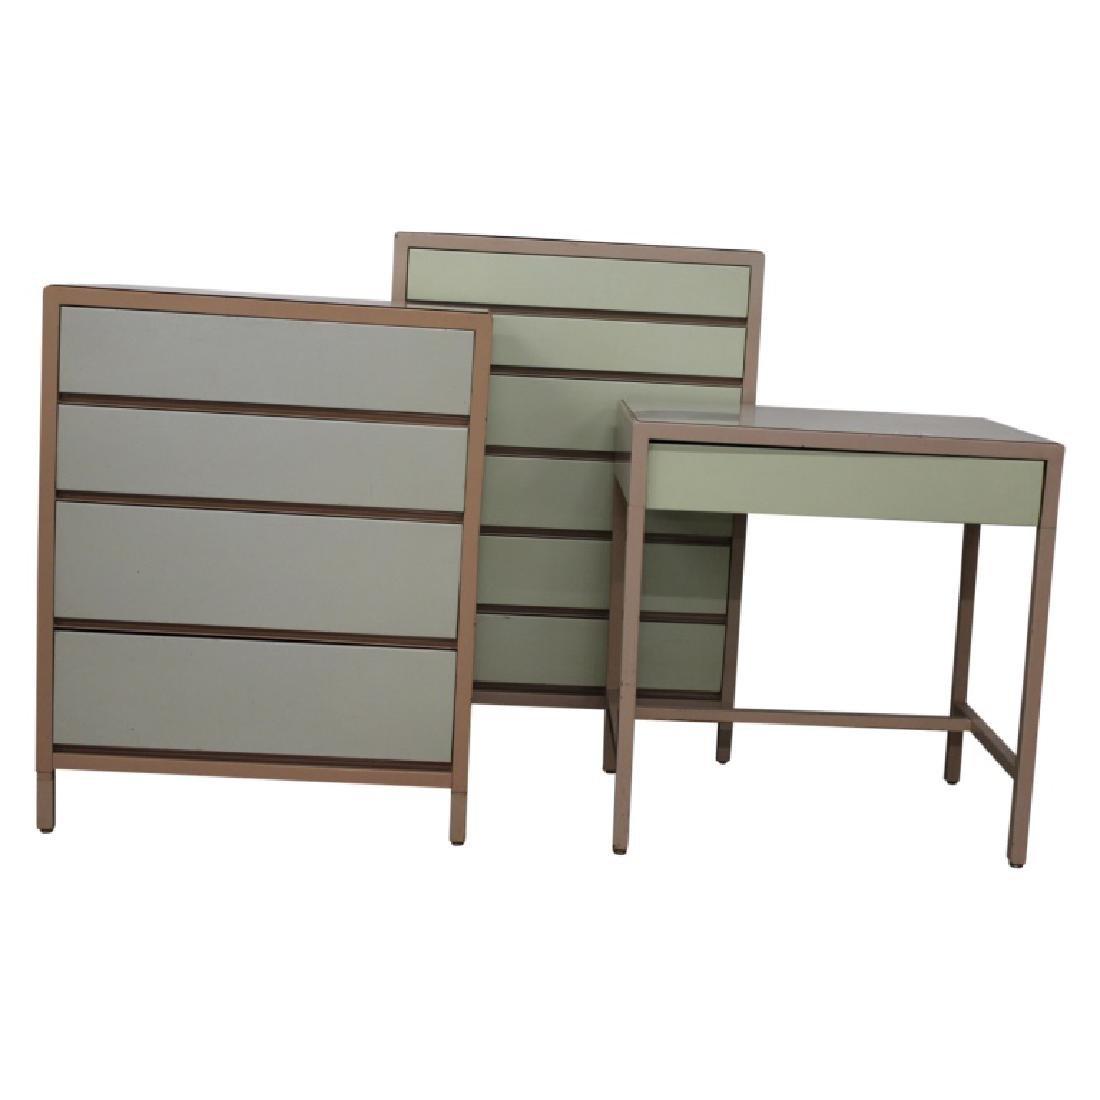 3 PC Modern Bedroom Set by Superior Sleep Rite - 3